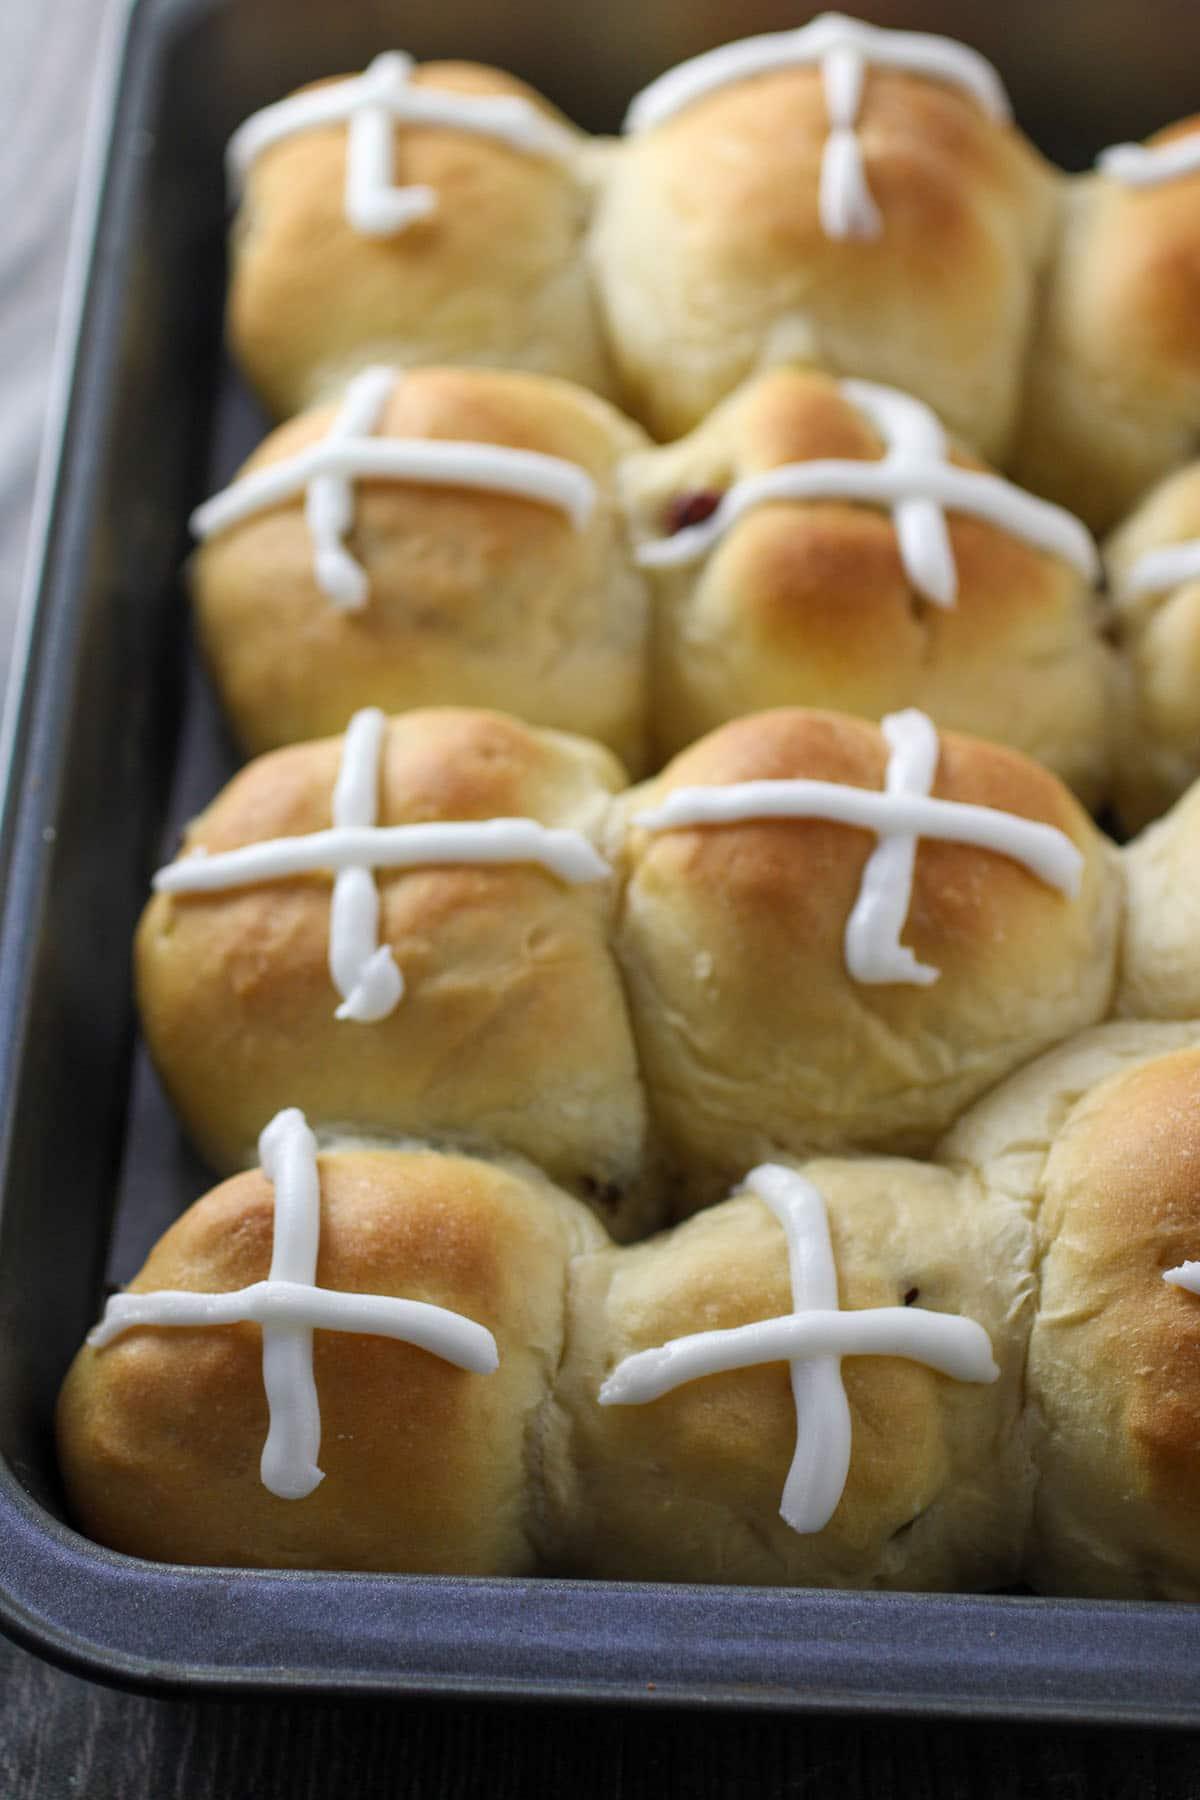 Hot cross buns on the baking pan.